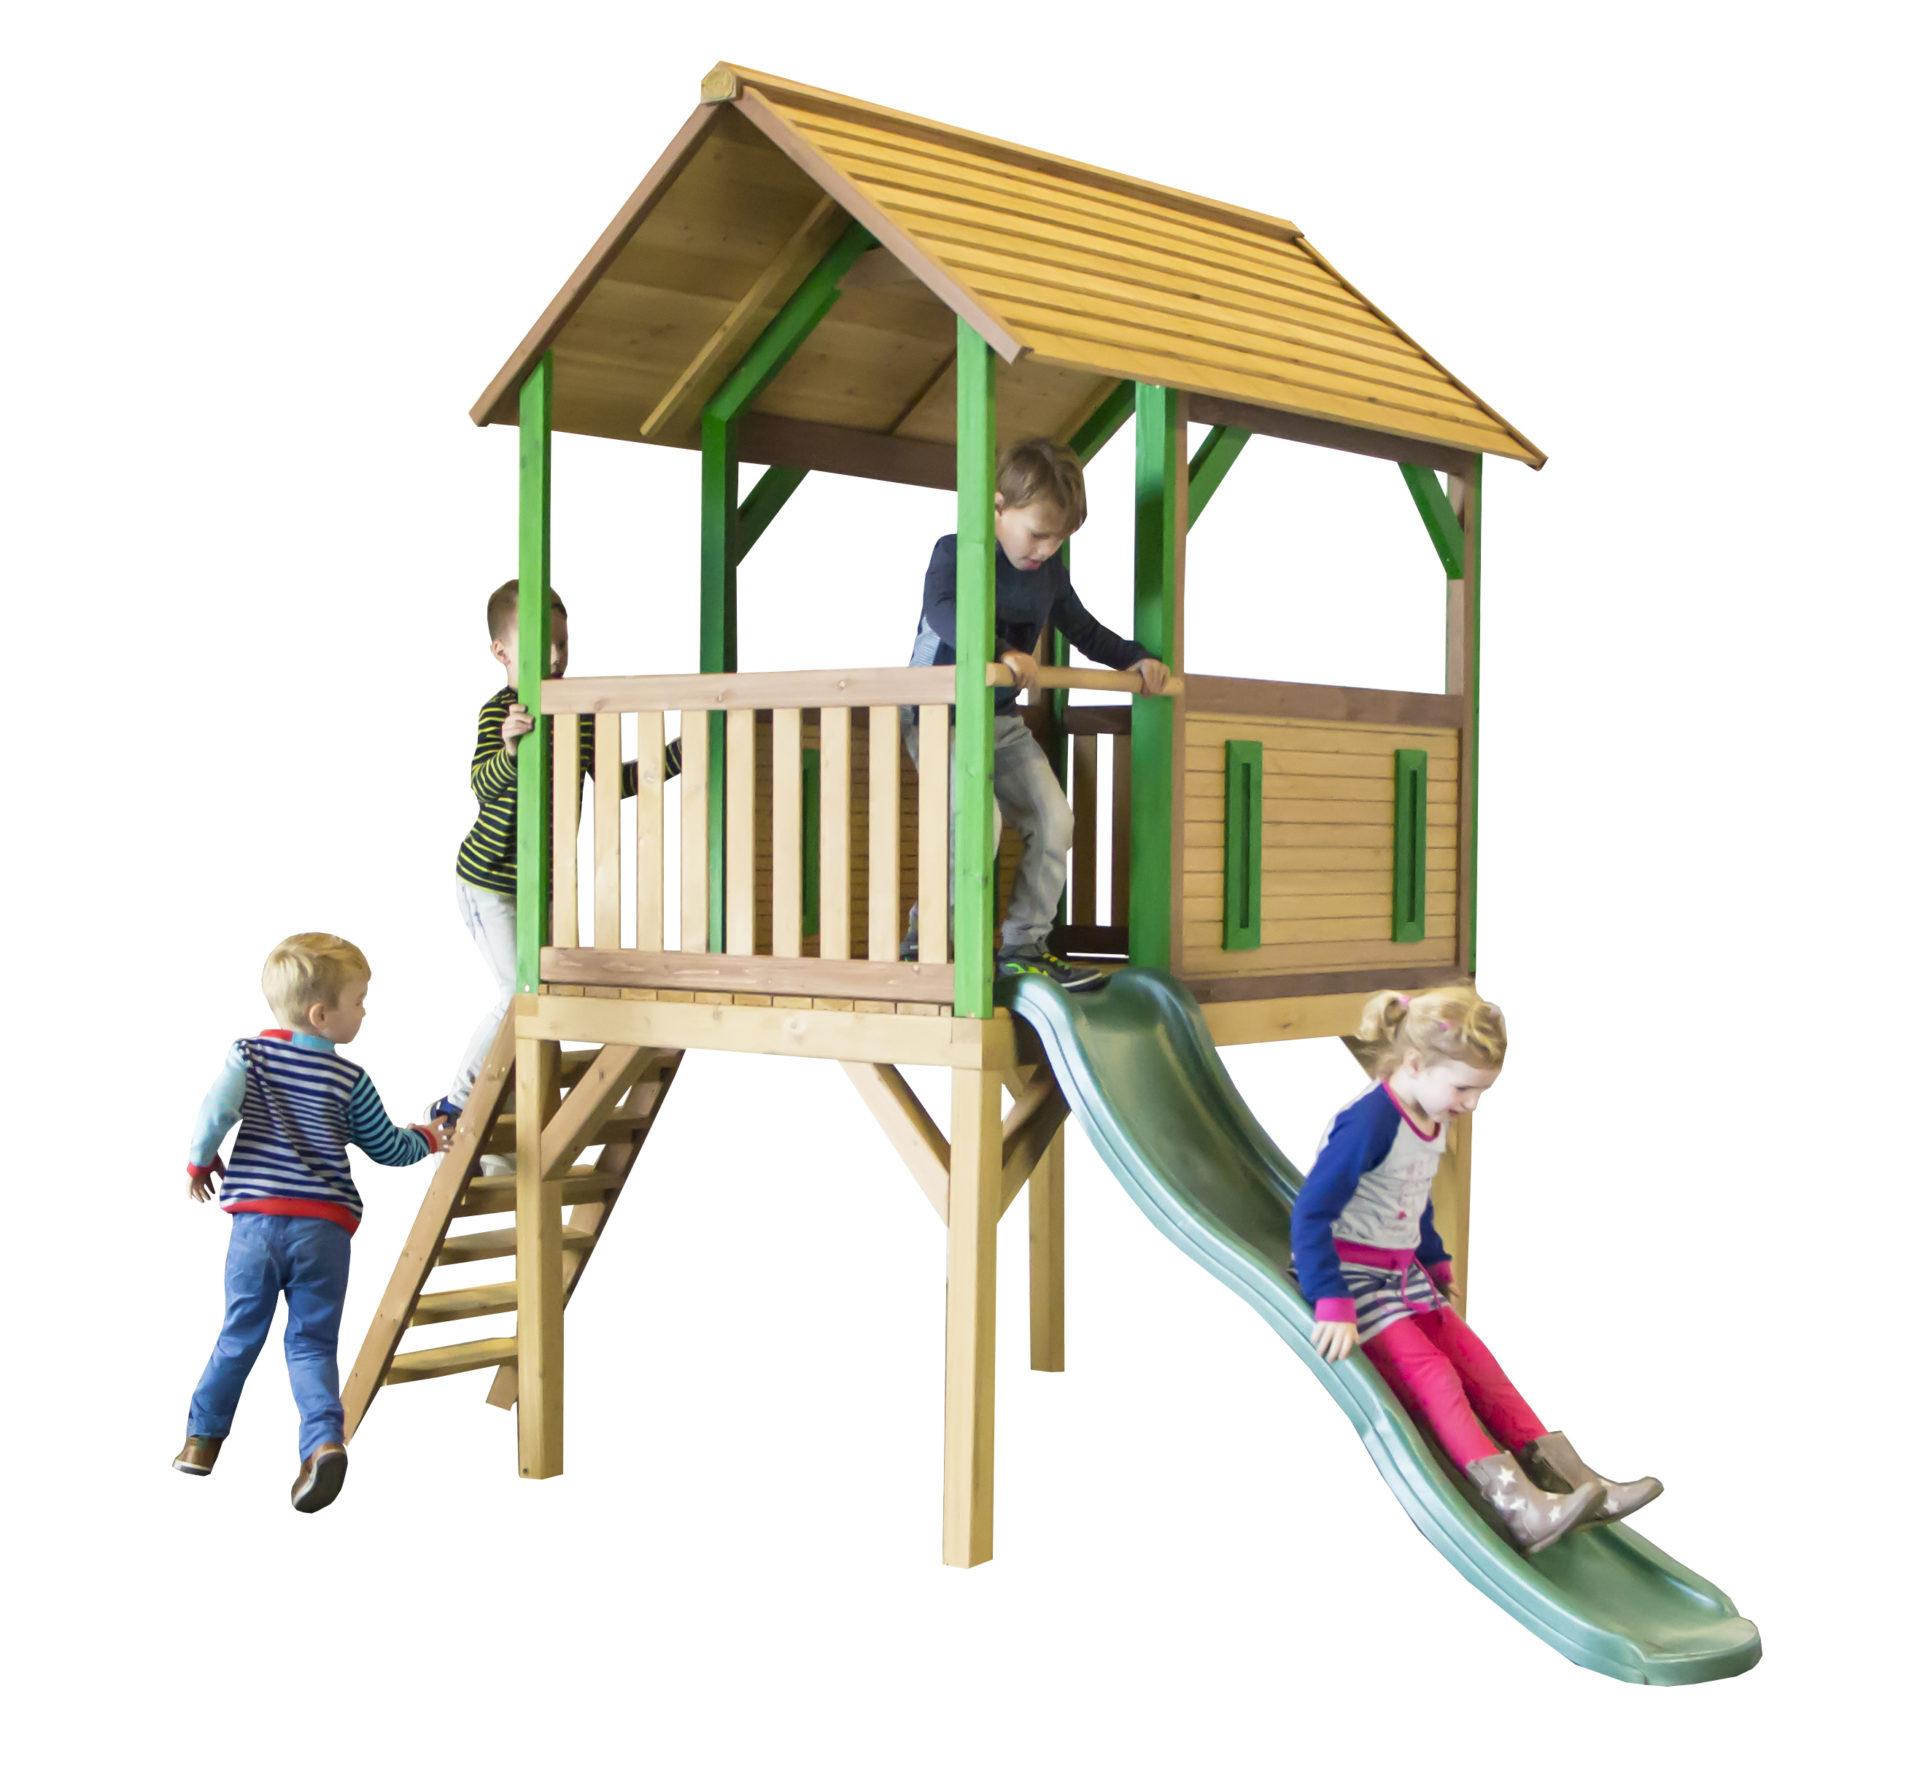 Sehr Kinderspielturm Bogo inkl. großer Rutsche - Bock-Spielgeräte VH82